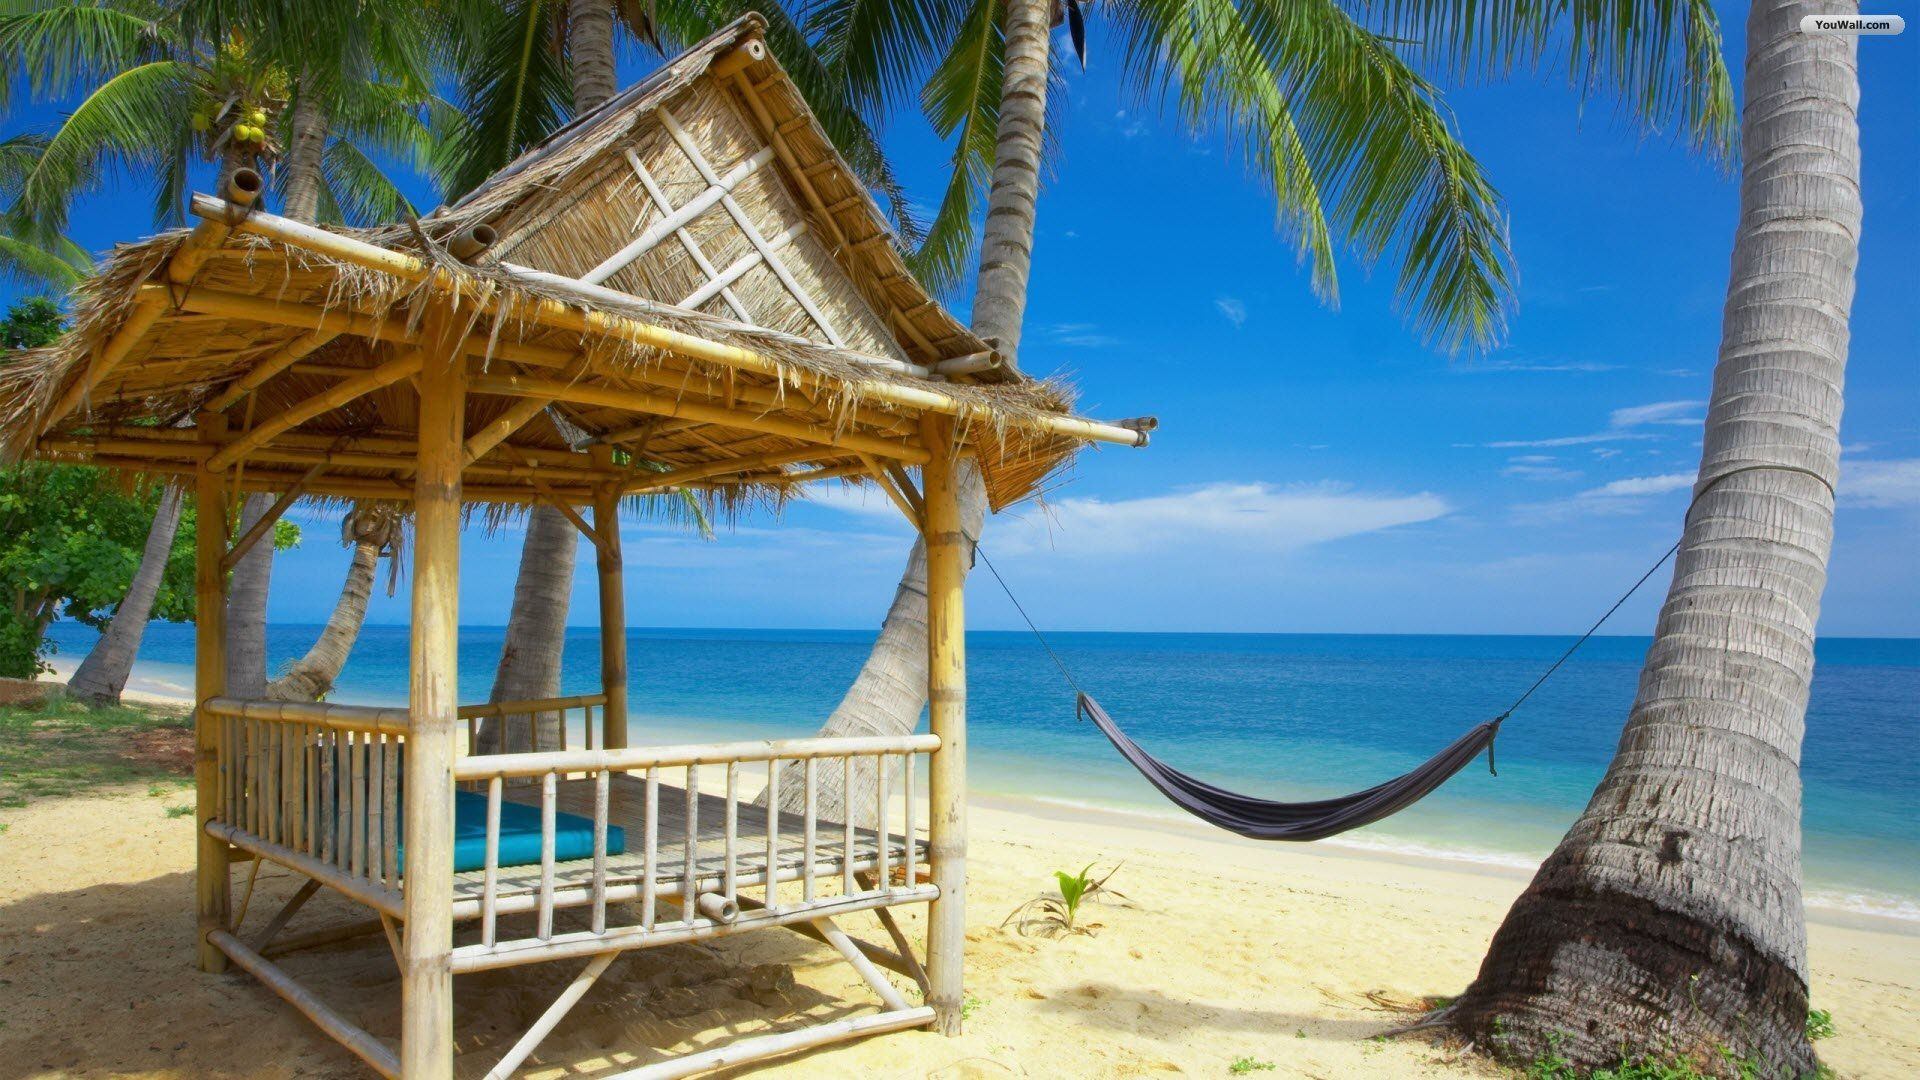 Luxury Mansion Villa Island - Beaches &amp- Nature Background ...